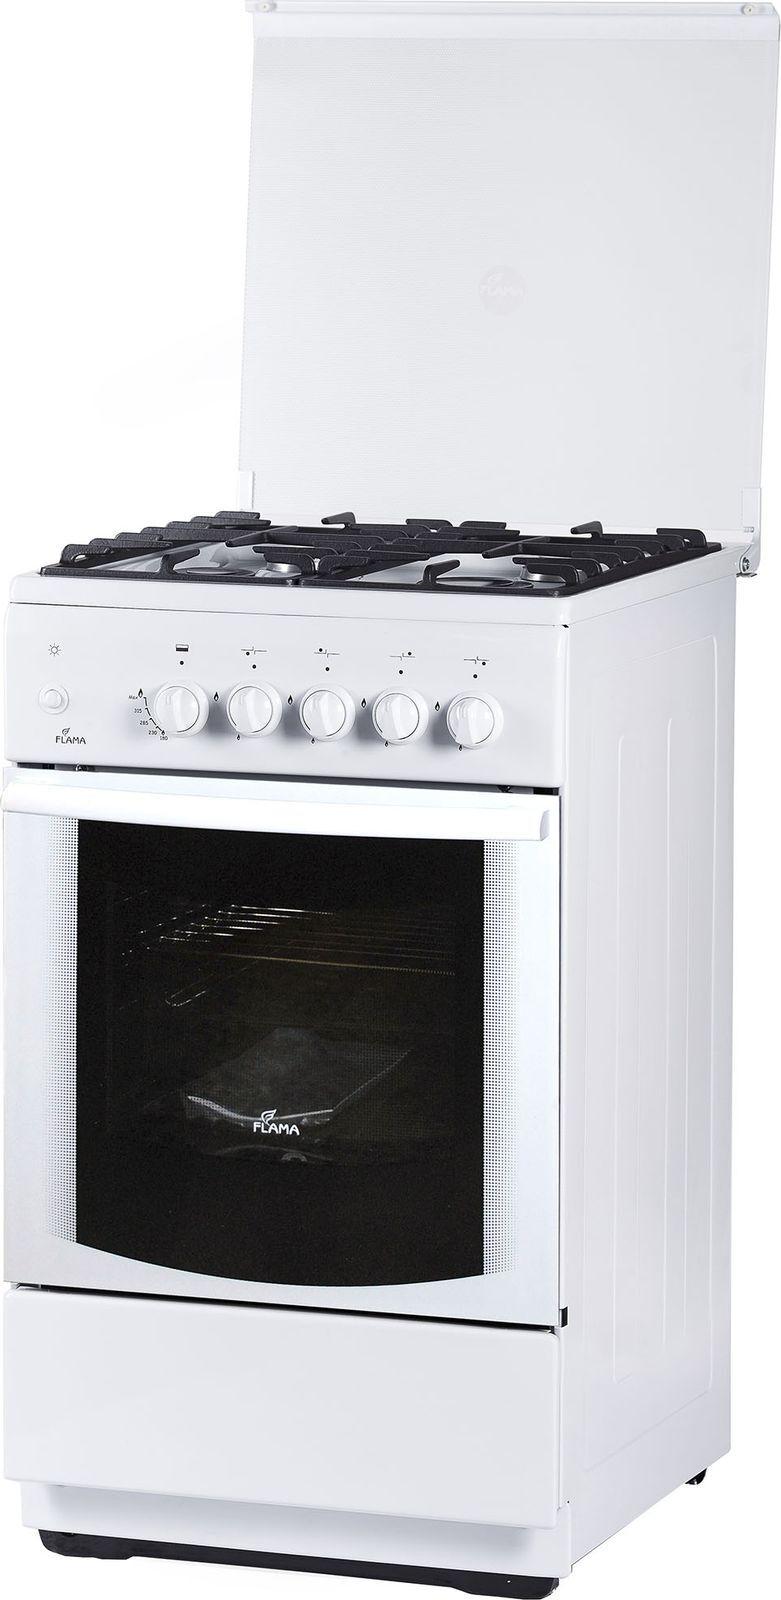 Кухонная плита Flama FG 24215 W, белый